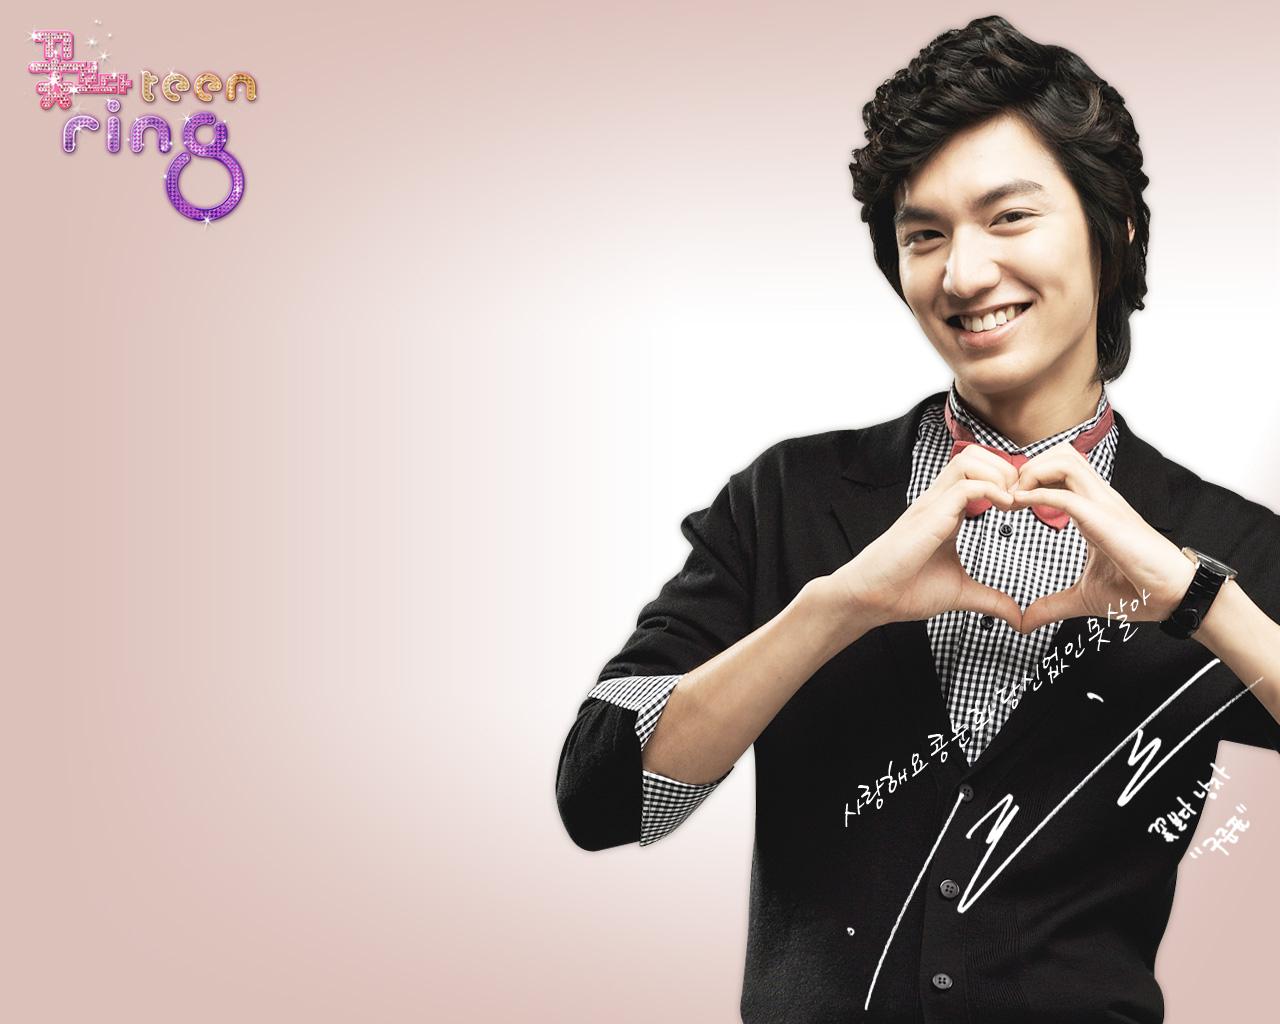 Lee Min Ho - Photos